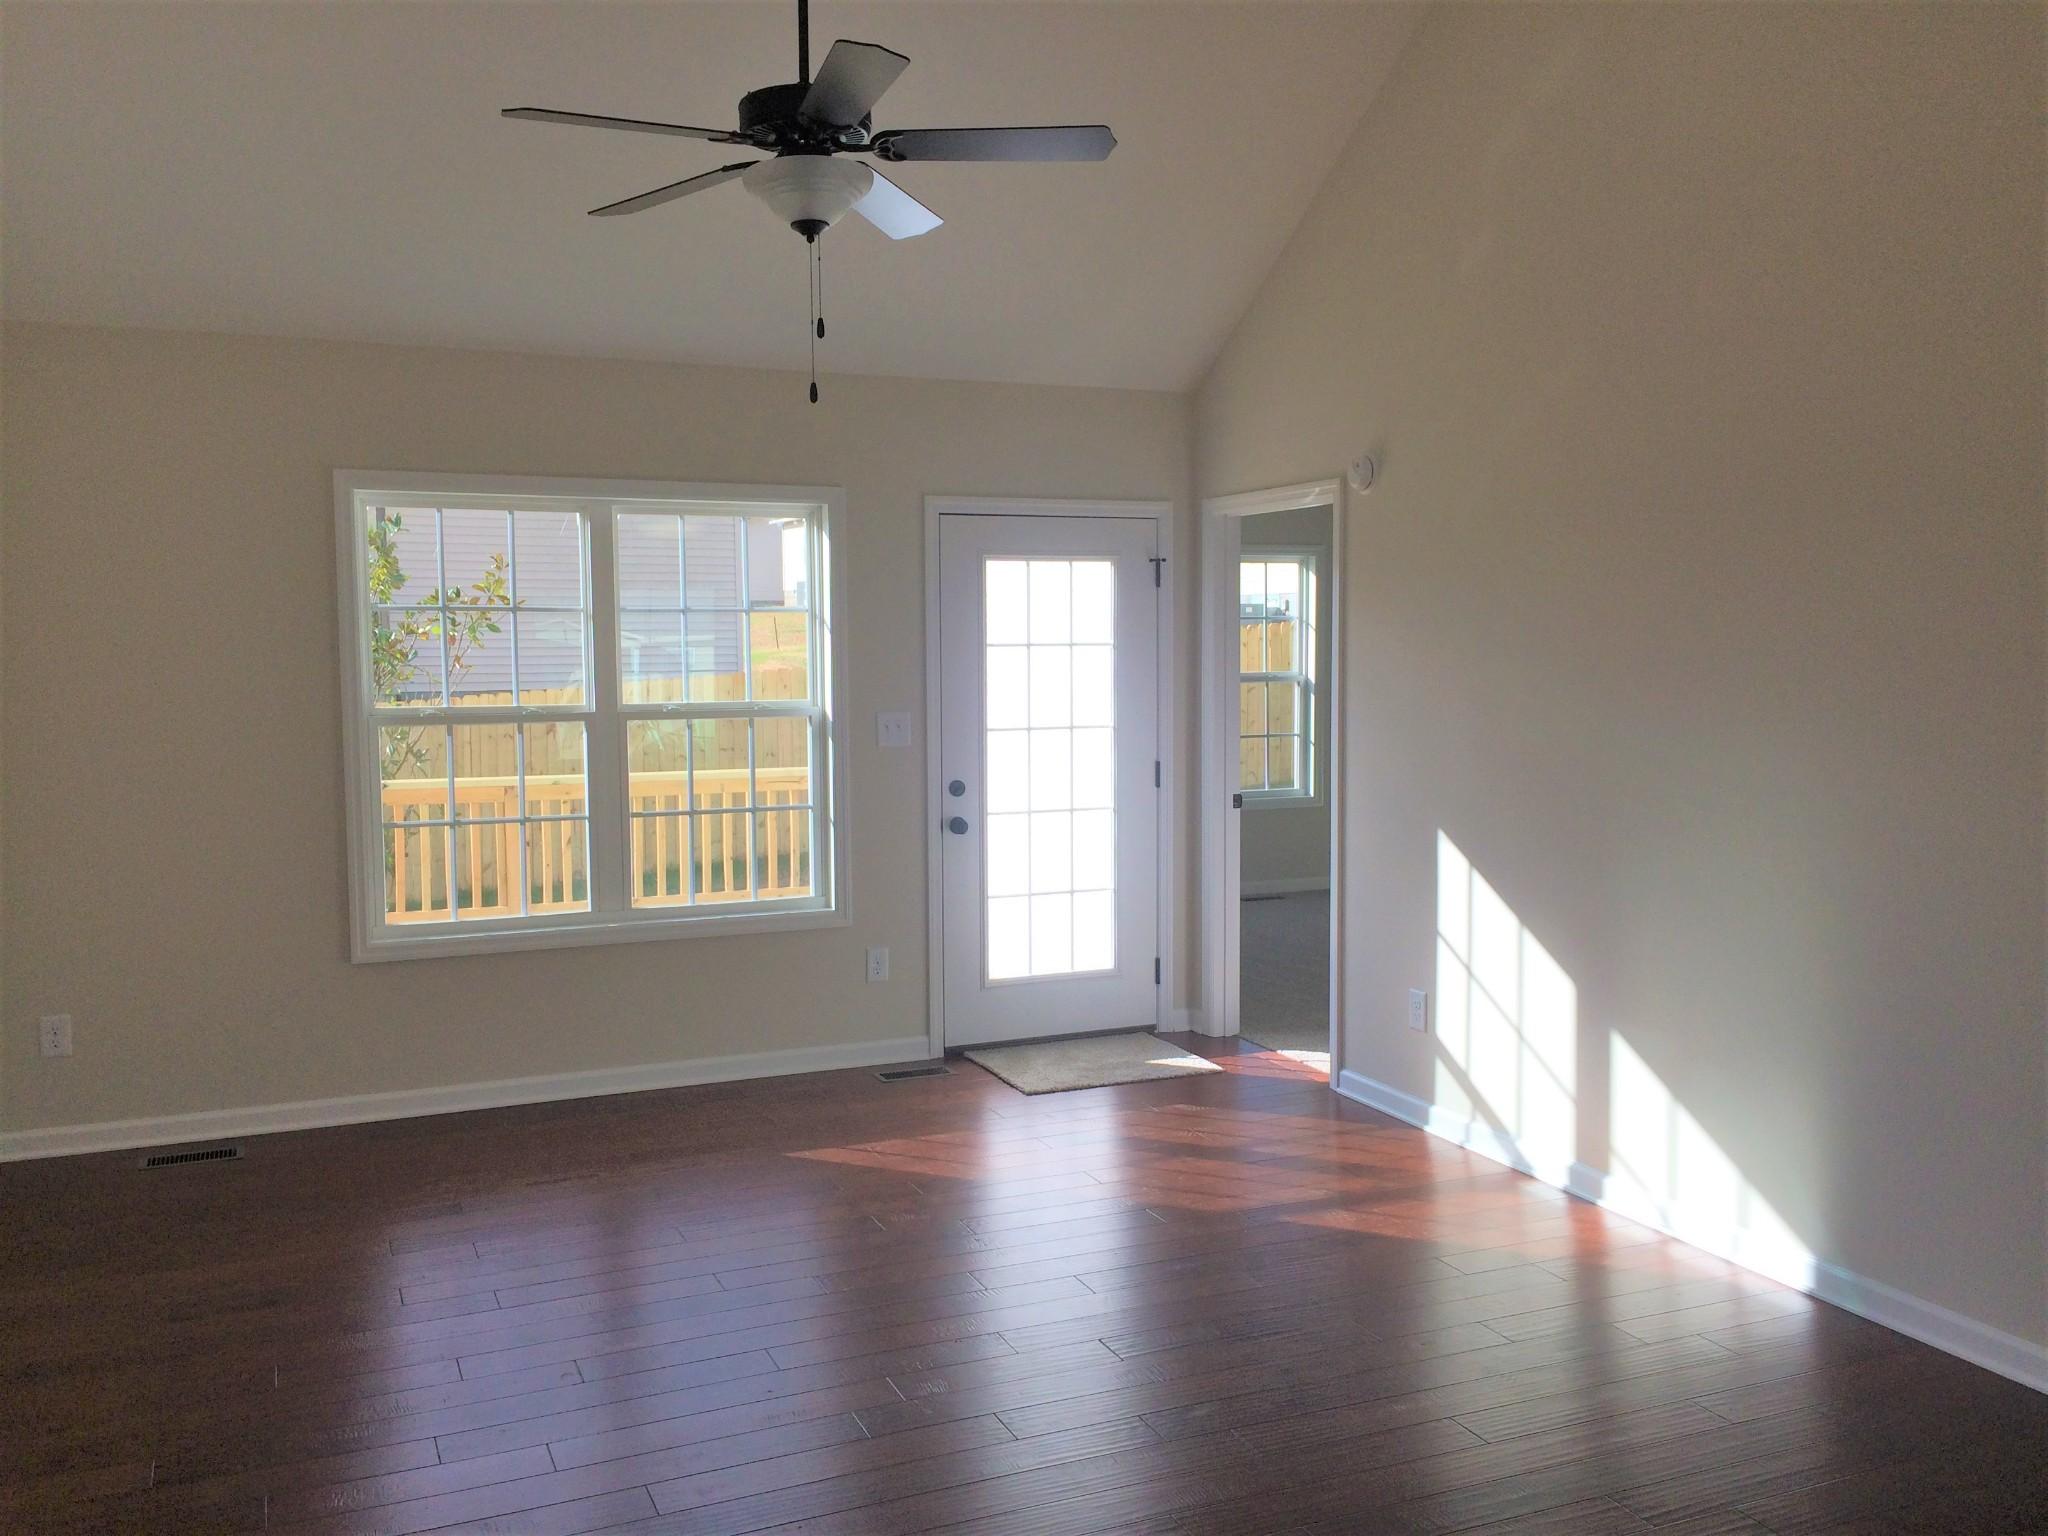 290 Modena Rd, Decherd, TN 37324 - Decherd, TN real estate listing